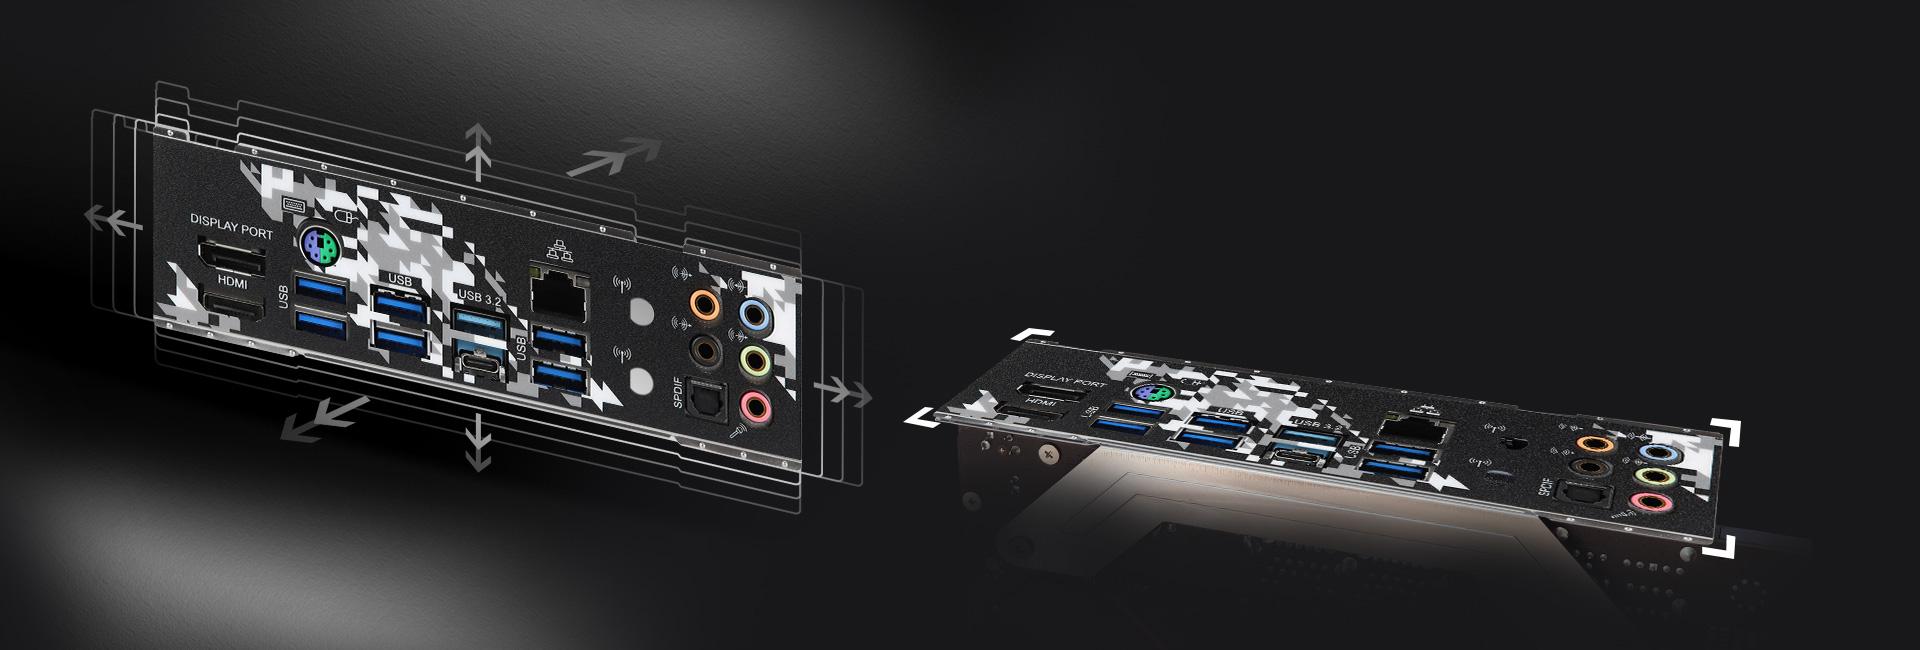 X570 Phantom Gaming X